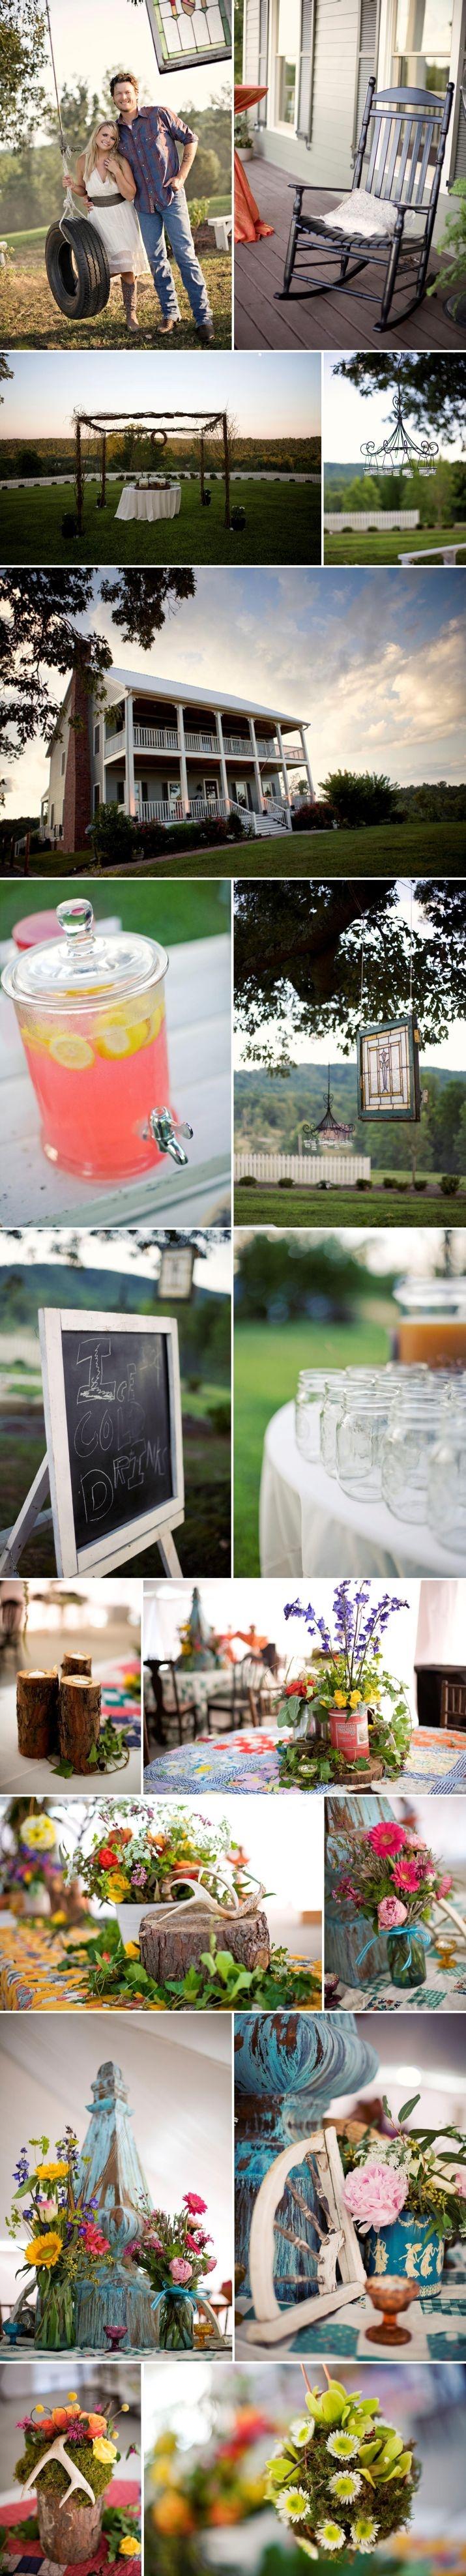 Southern Engagement Party: Miranda + Blake, Part I « Southern Weddings Magazine